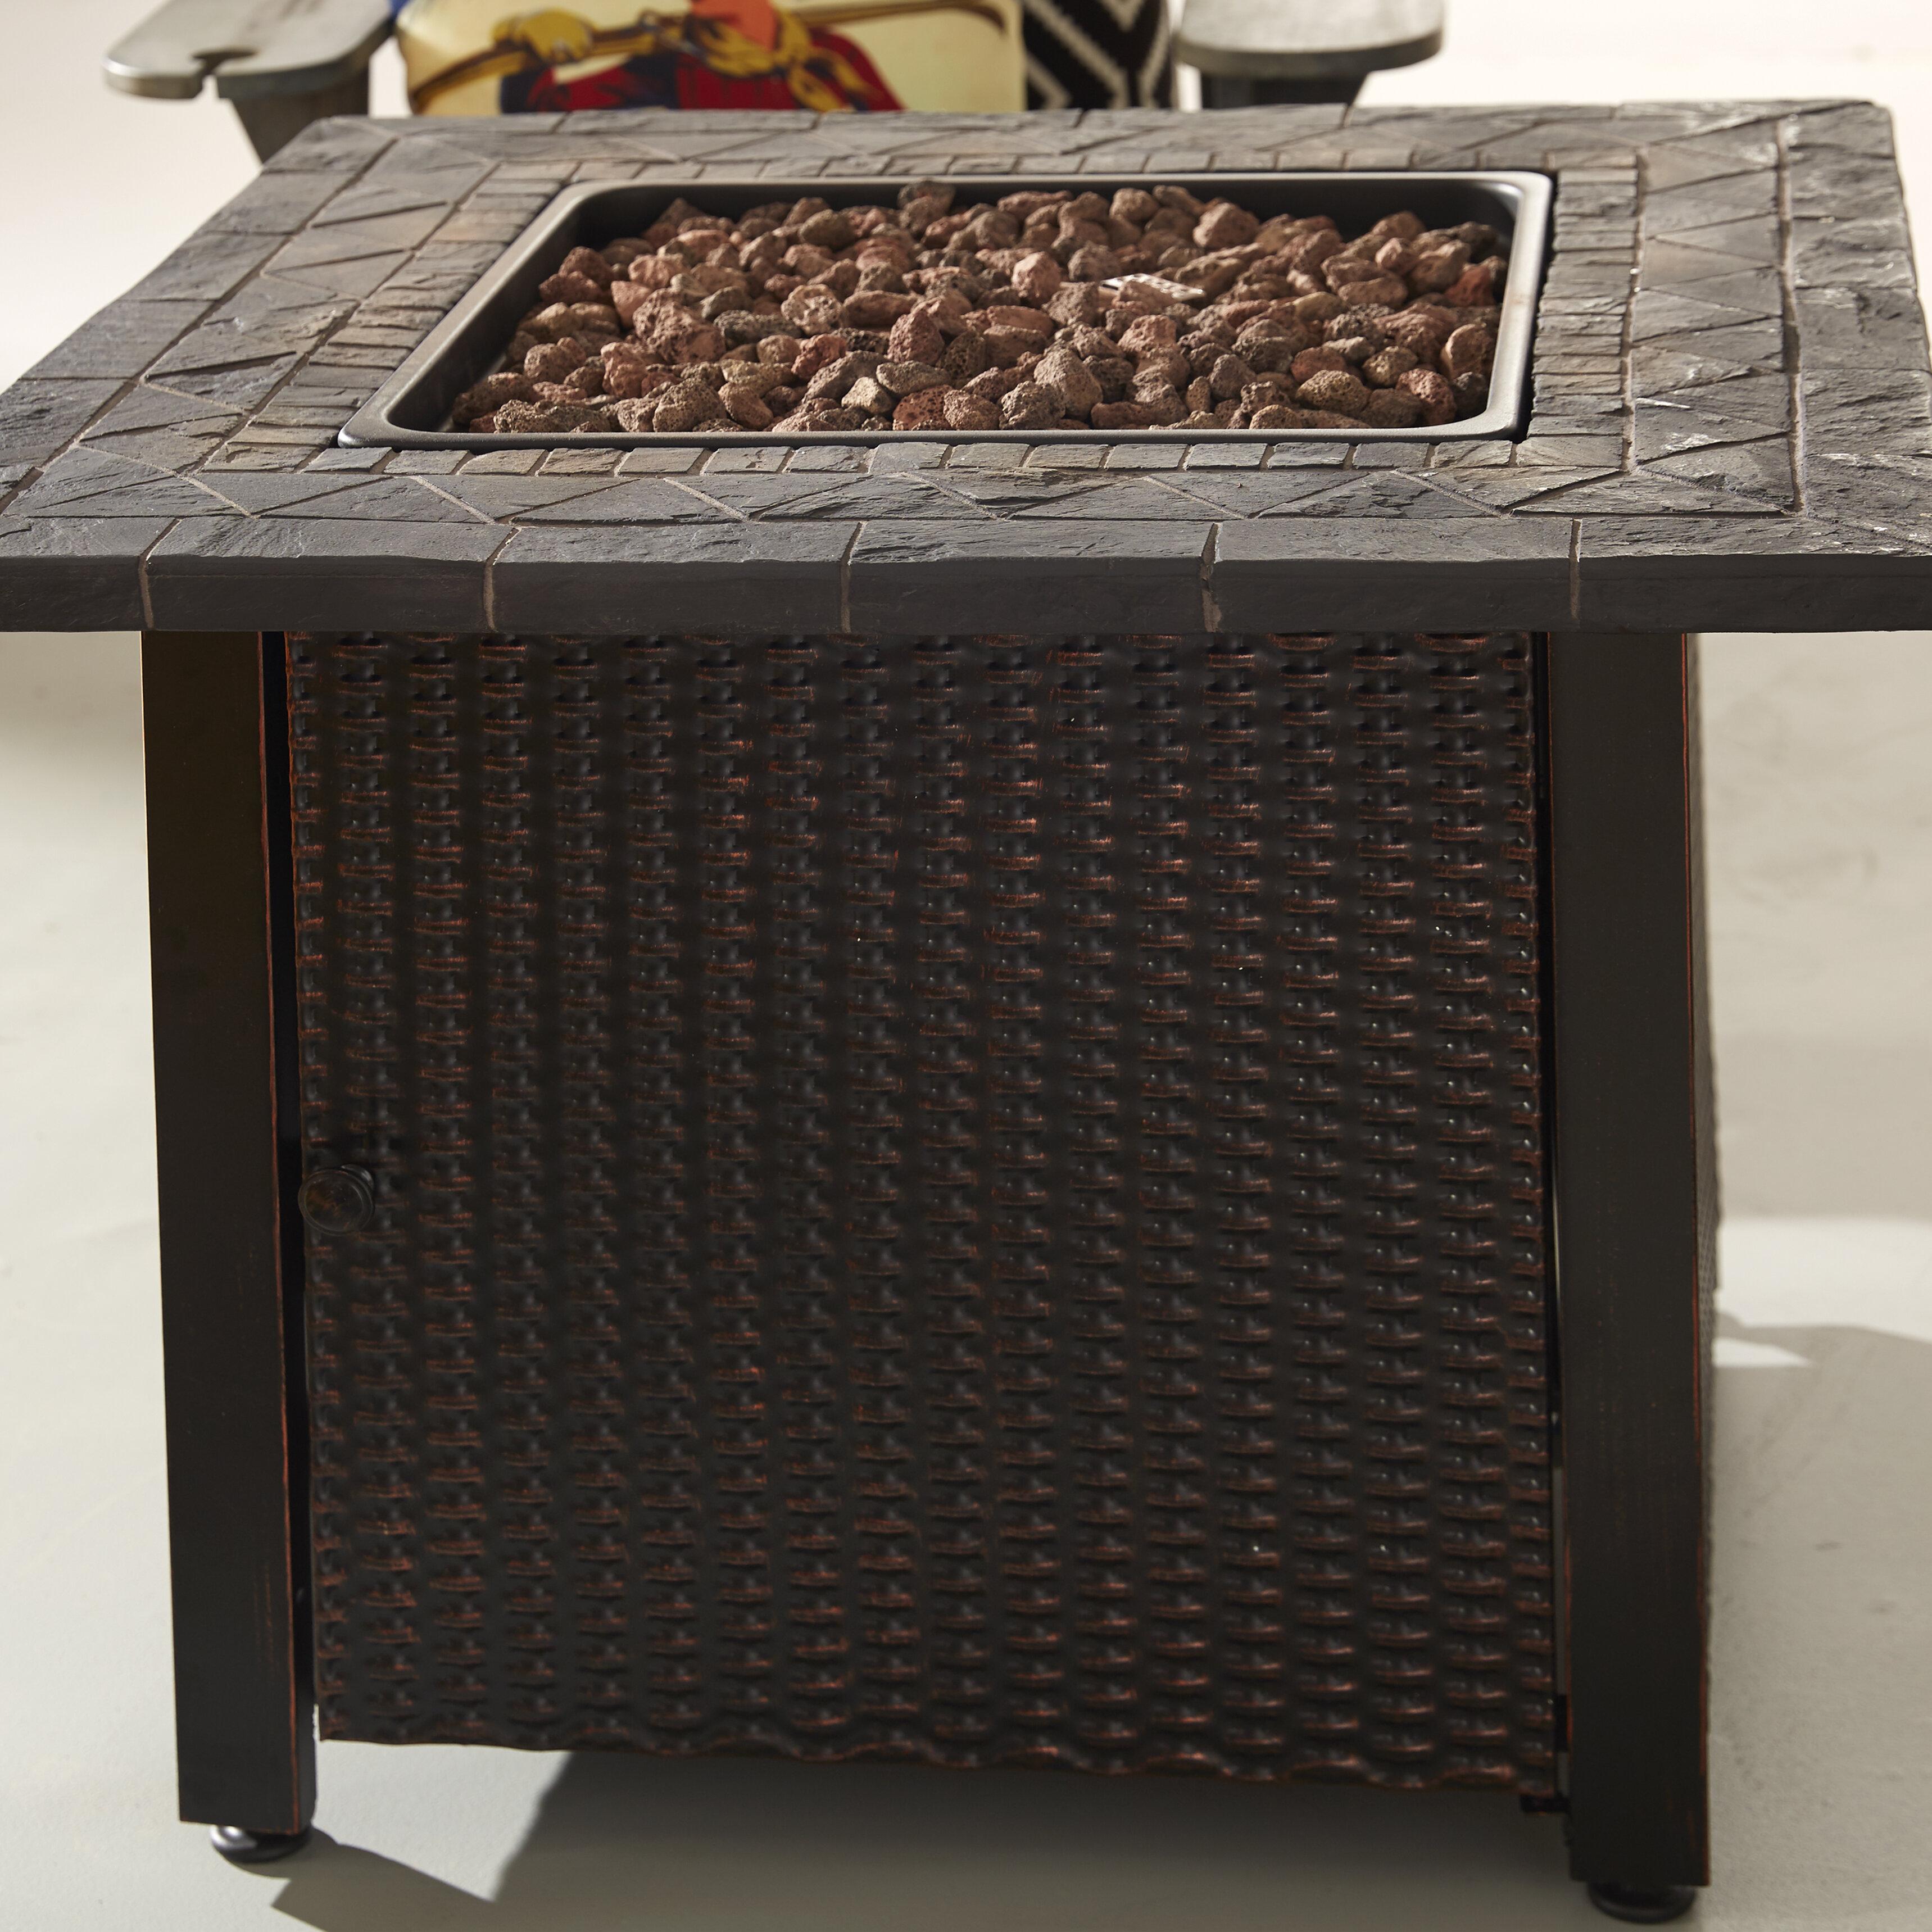 Endless Summer Outdoor Propane Fire Pit Table Reviews Wayfair